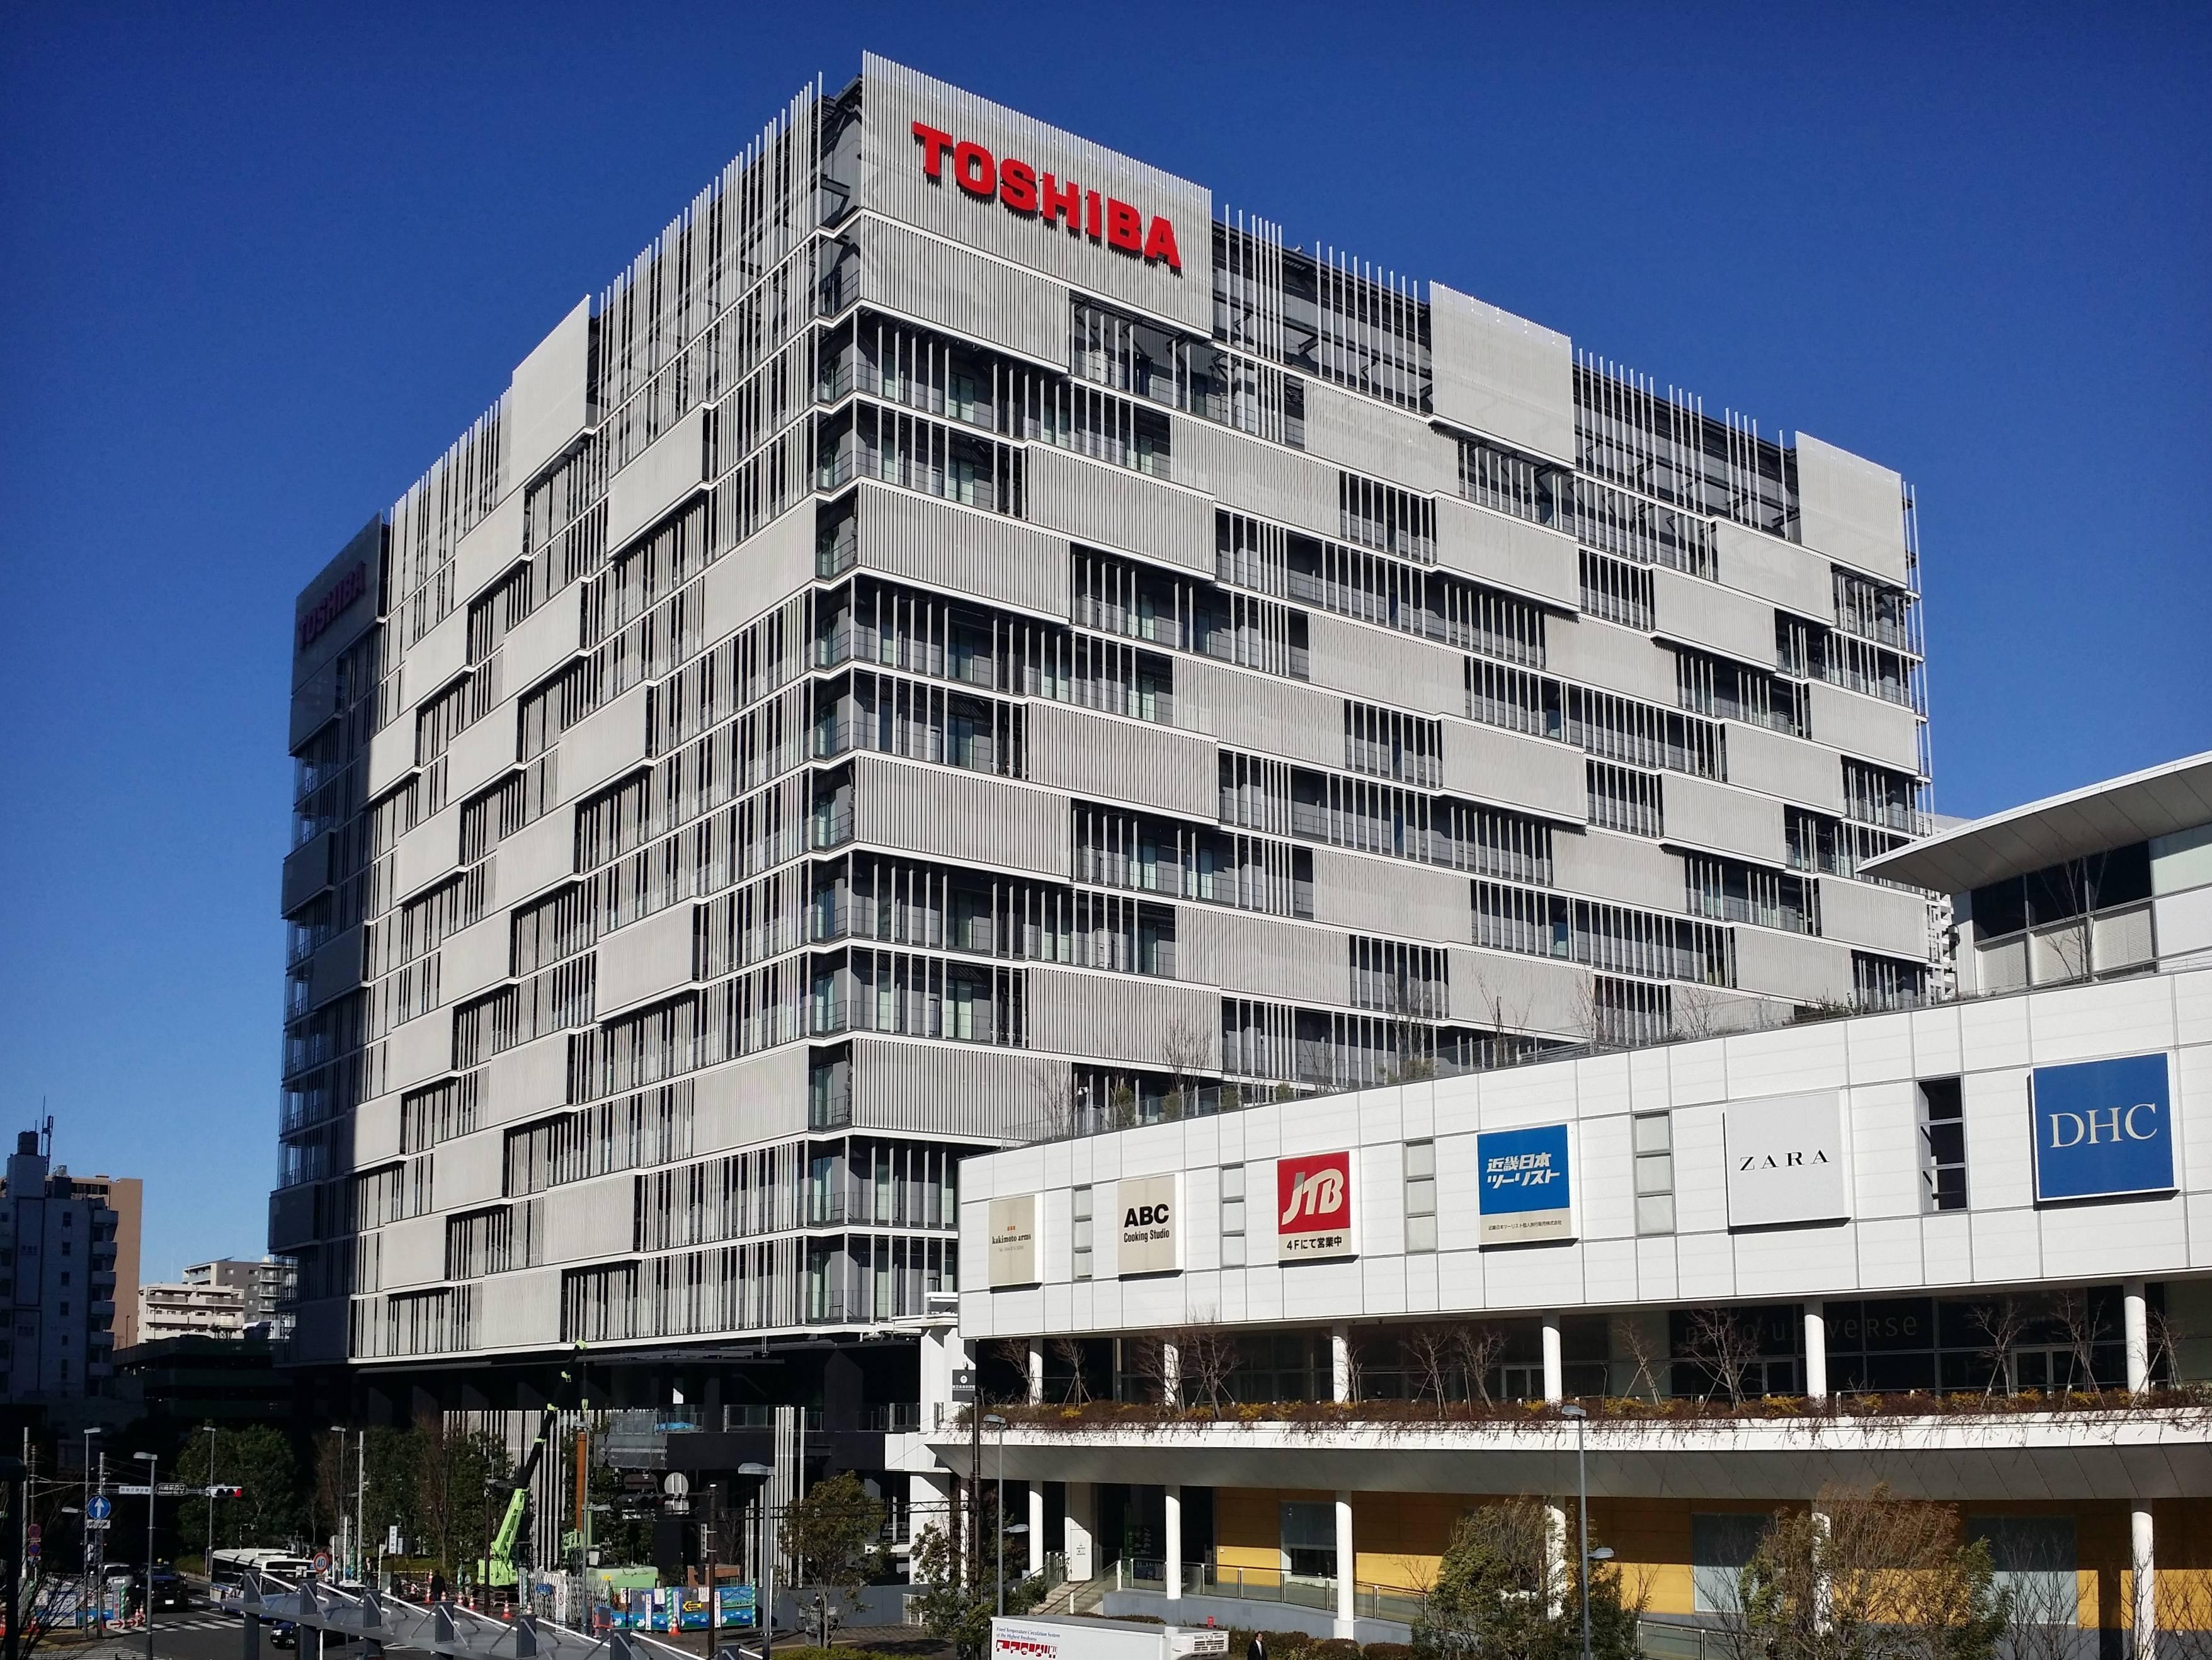 lazona kawasaki toshiba building.jpg?resize=648,365 - 東芝大分工場の社員の命運を分けた「ソニー」「東芝」の2択問題